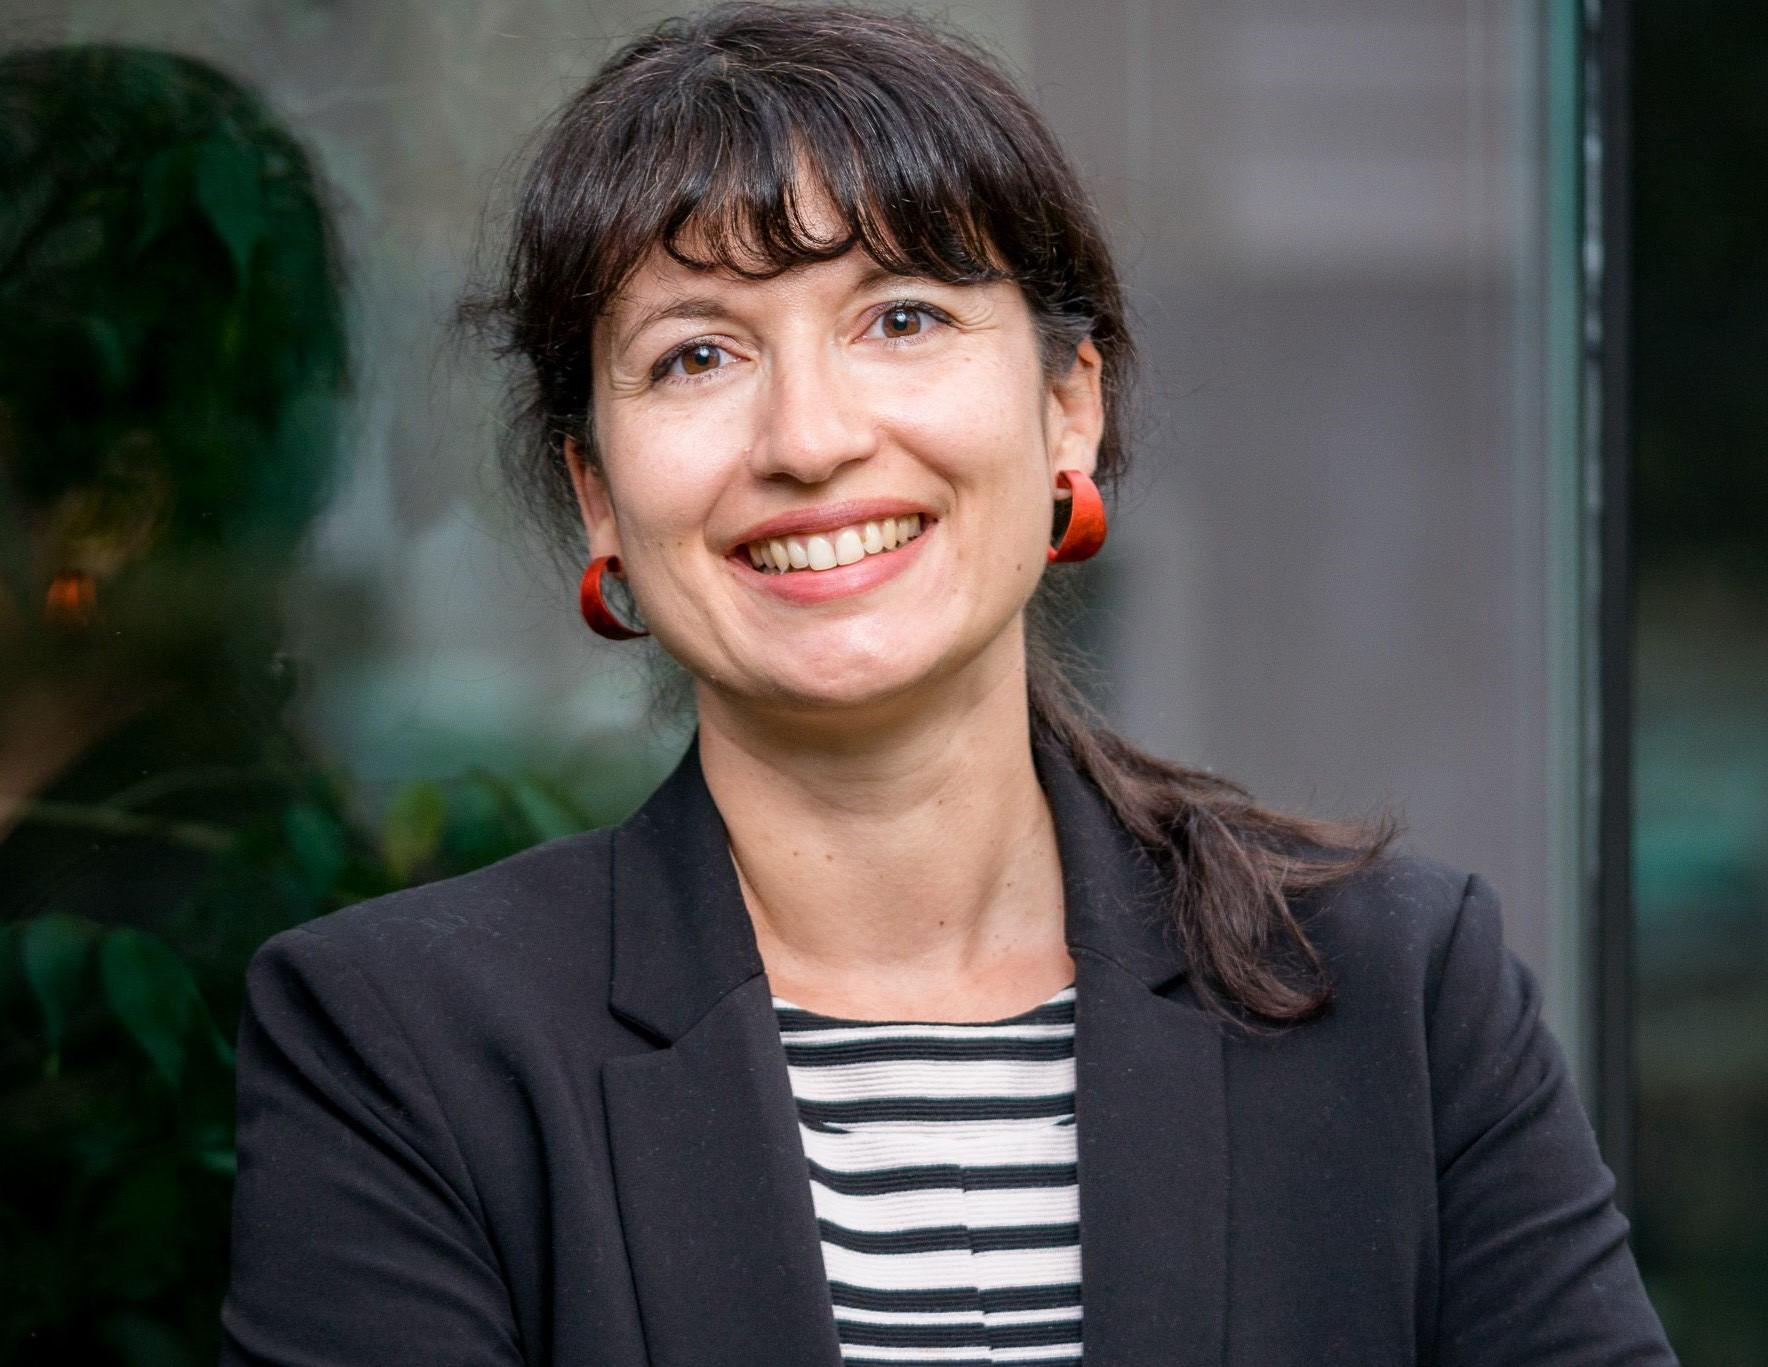 Stefanie Speidel